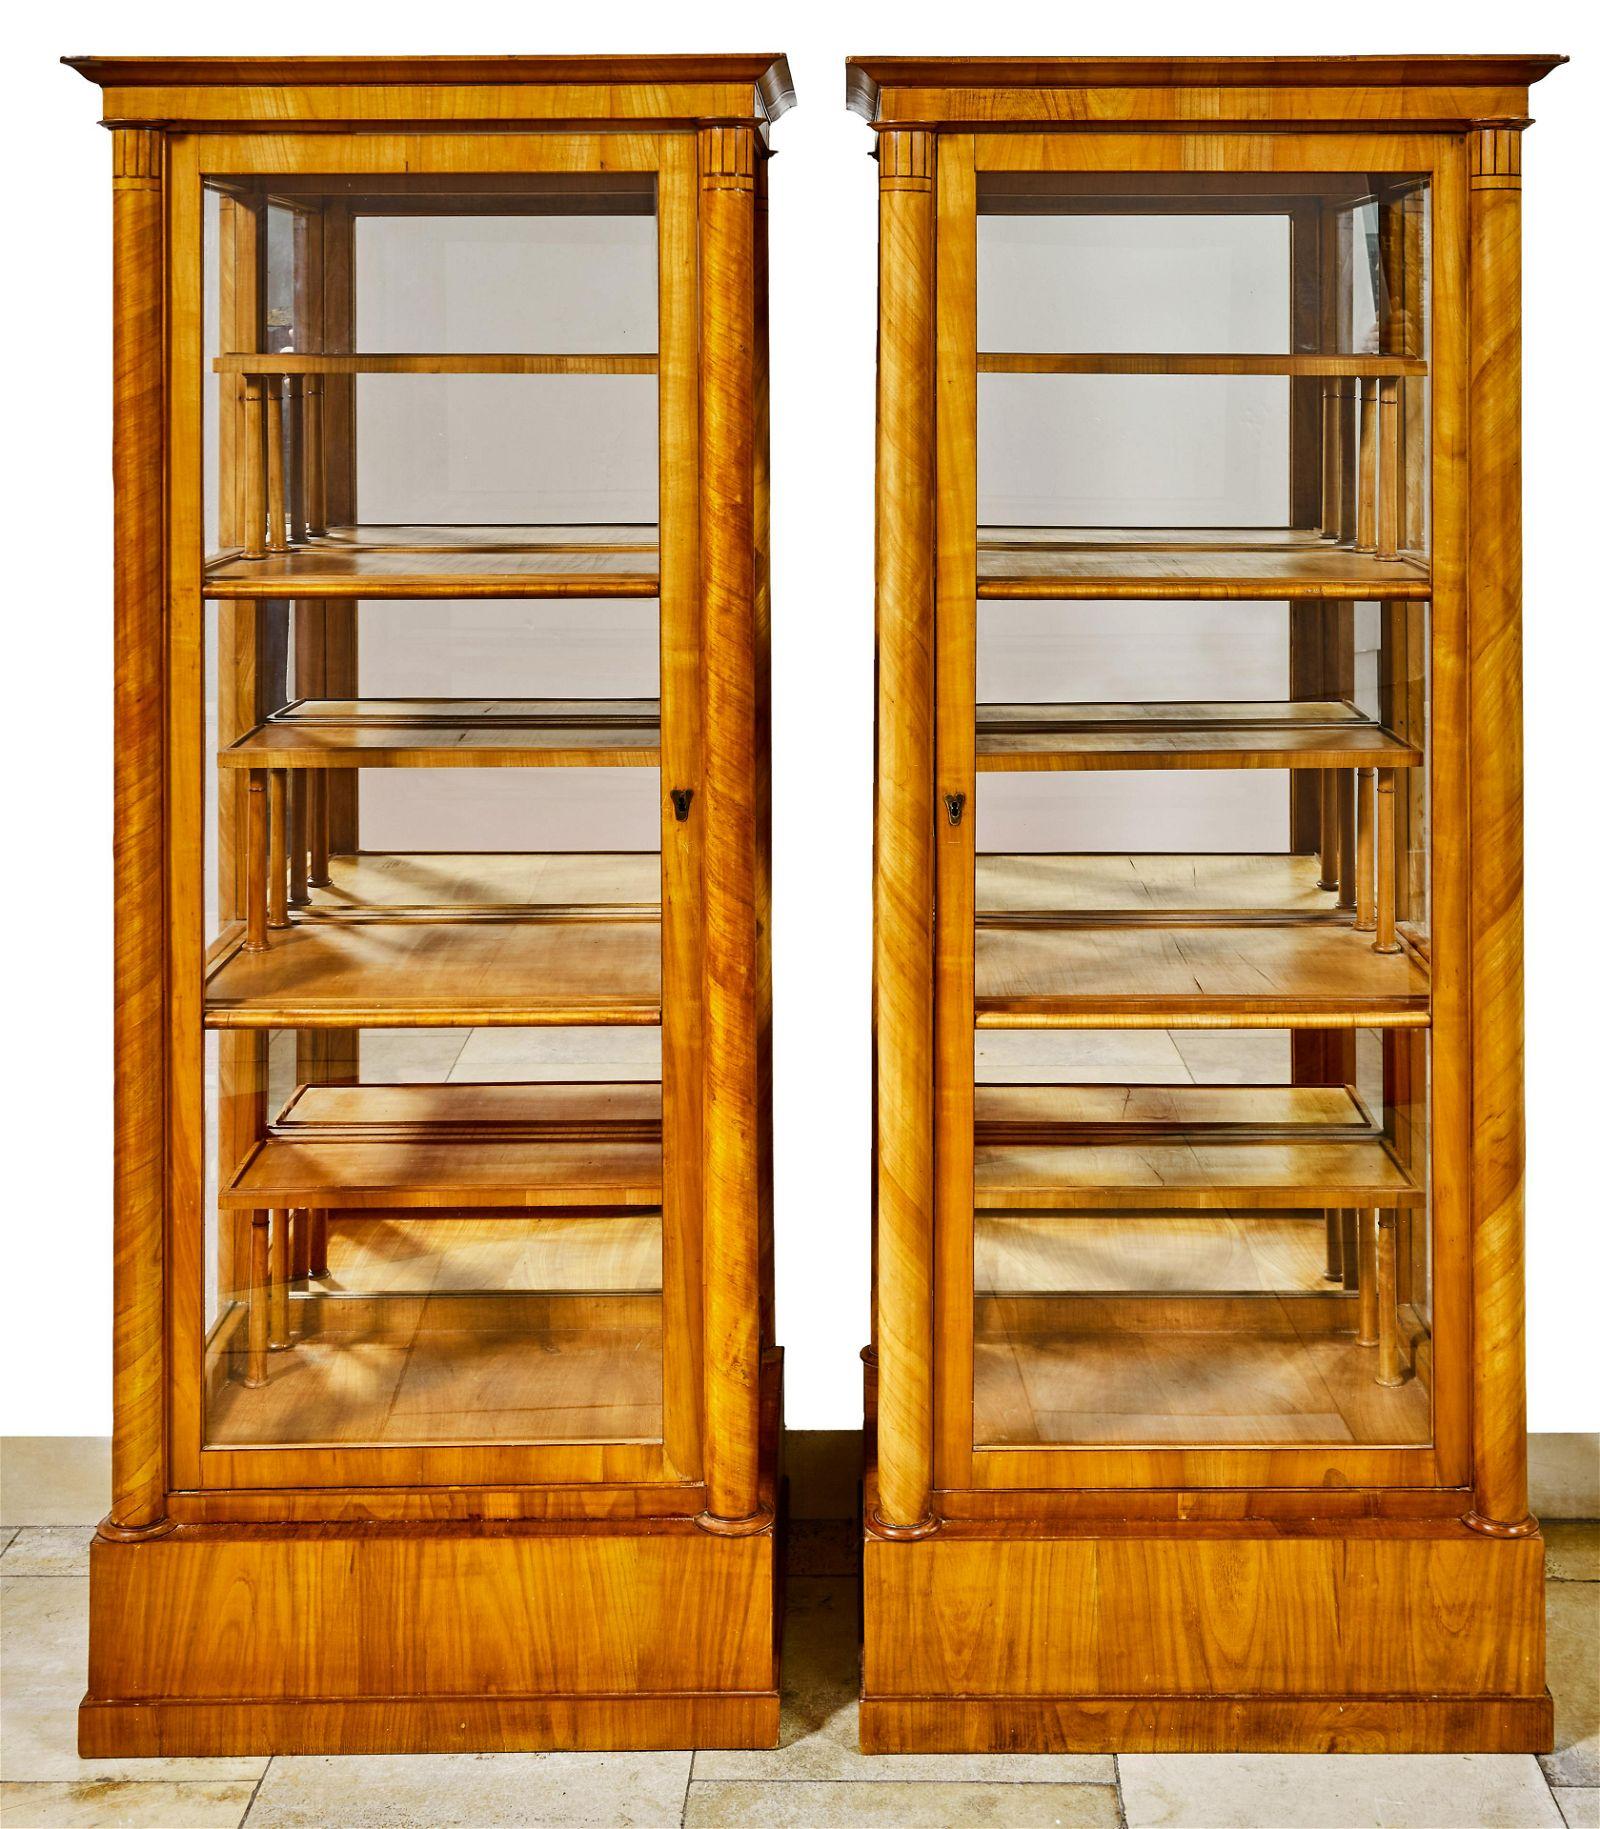 Seltenes Paar Biedermeier-Vitrinen, Wien, um 1820